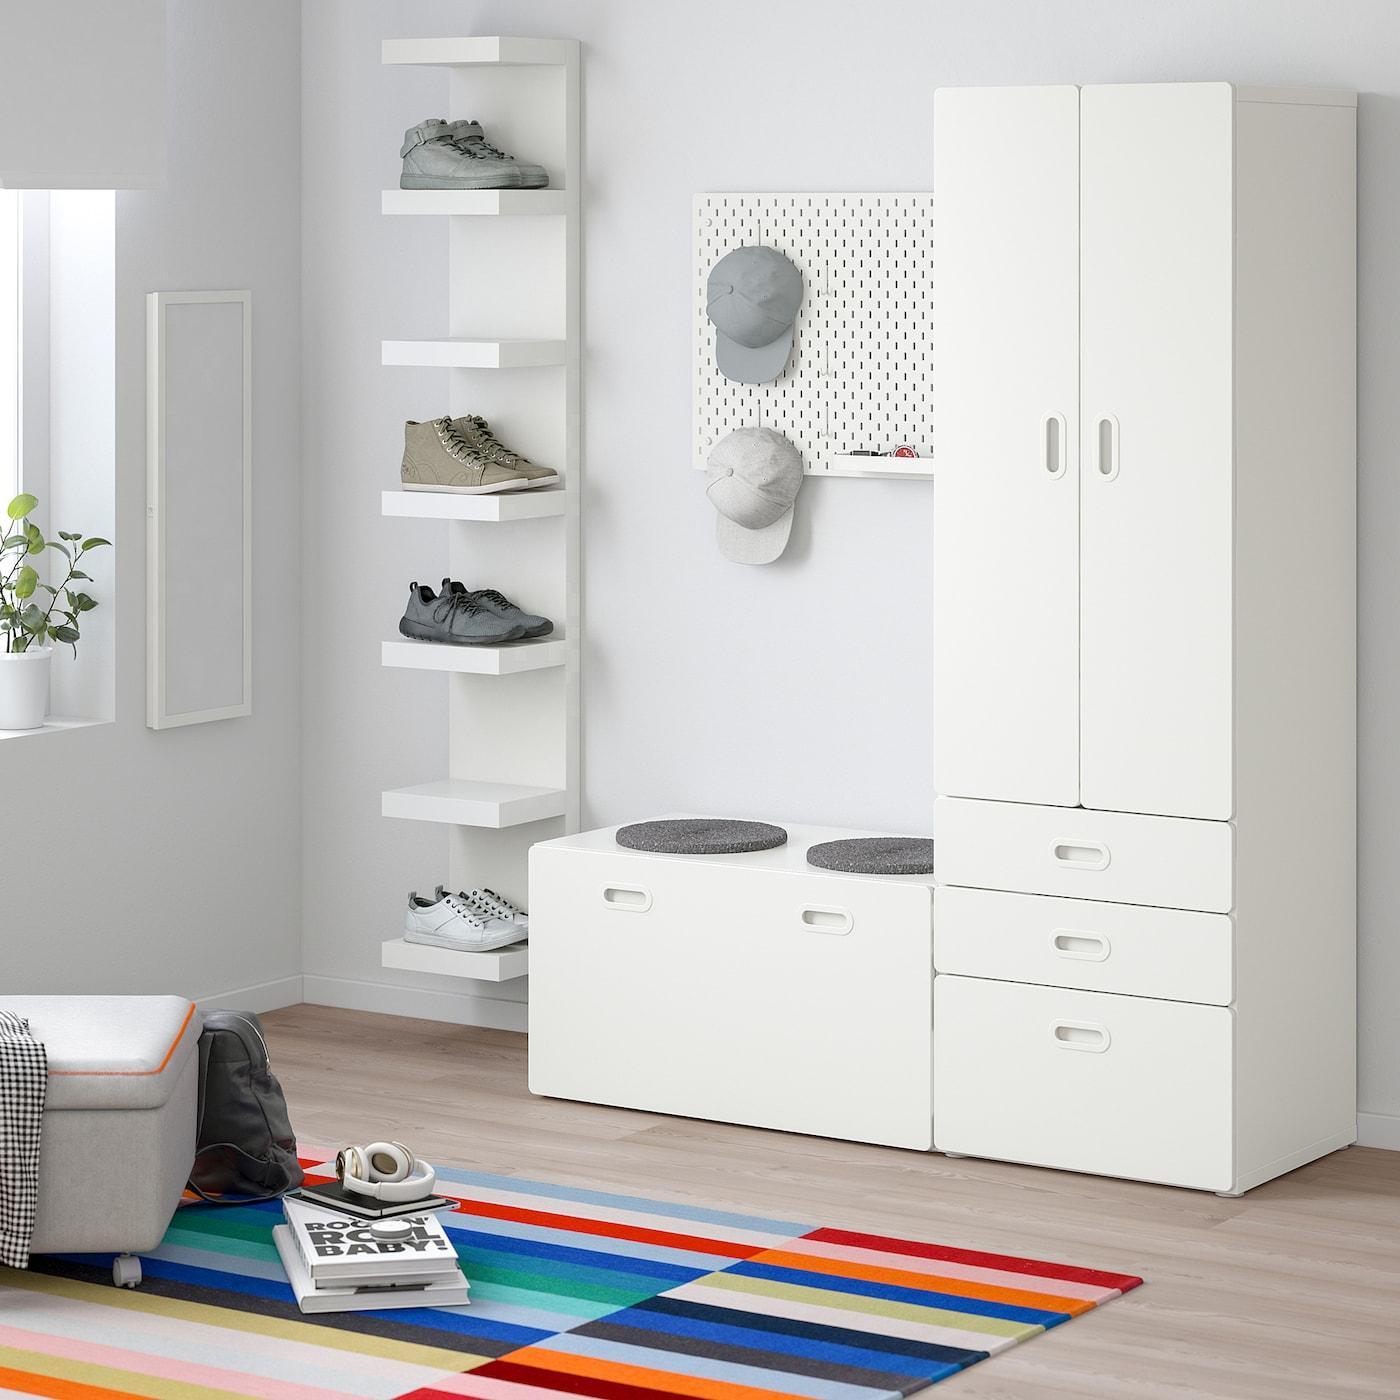 Wardrobe With Storage Bench Stuva Fritids White White